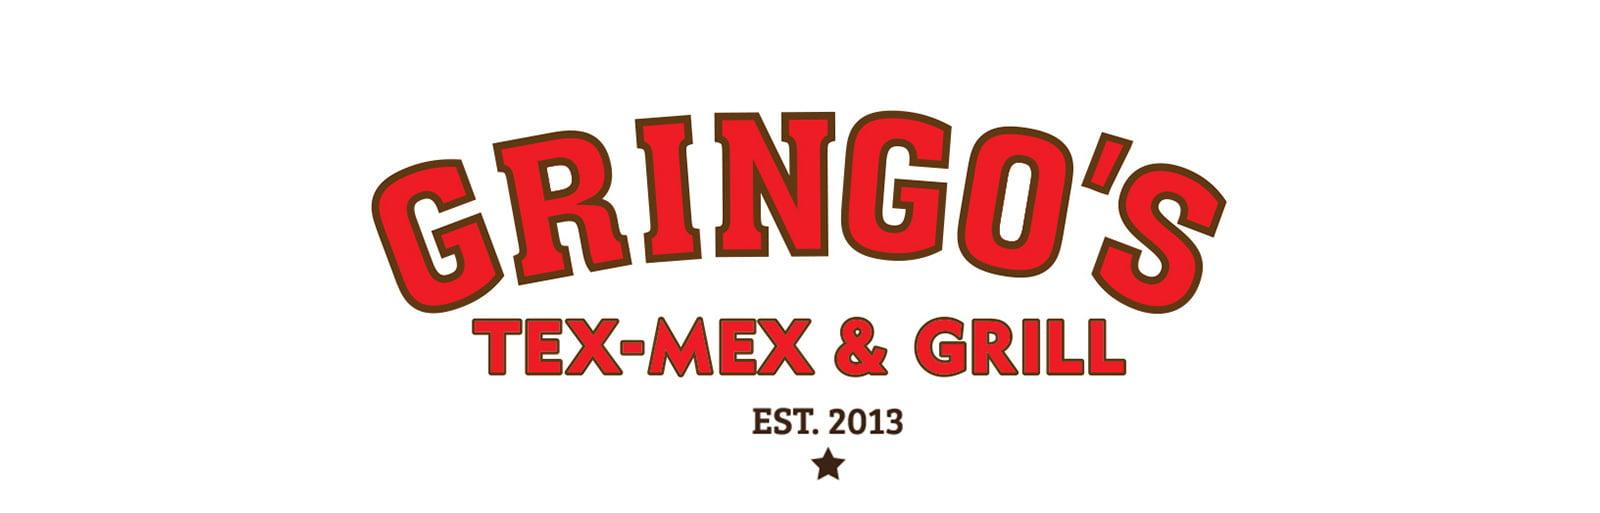 tex mex gringos